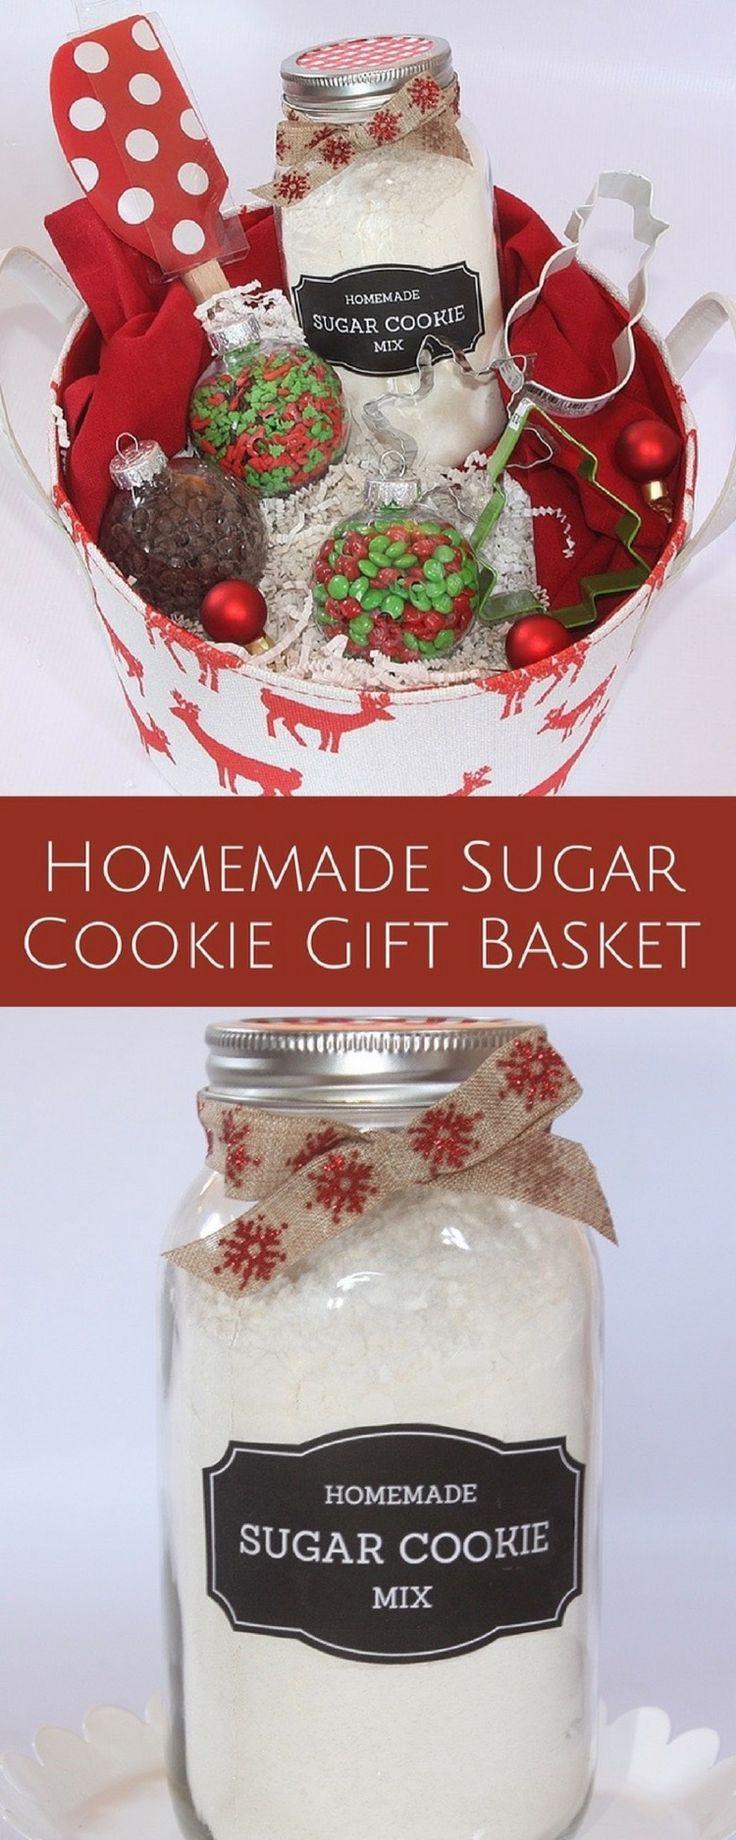 Homemade Sugar Cookie Gift Basket